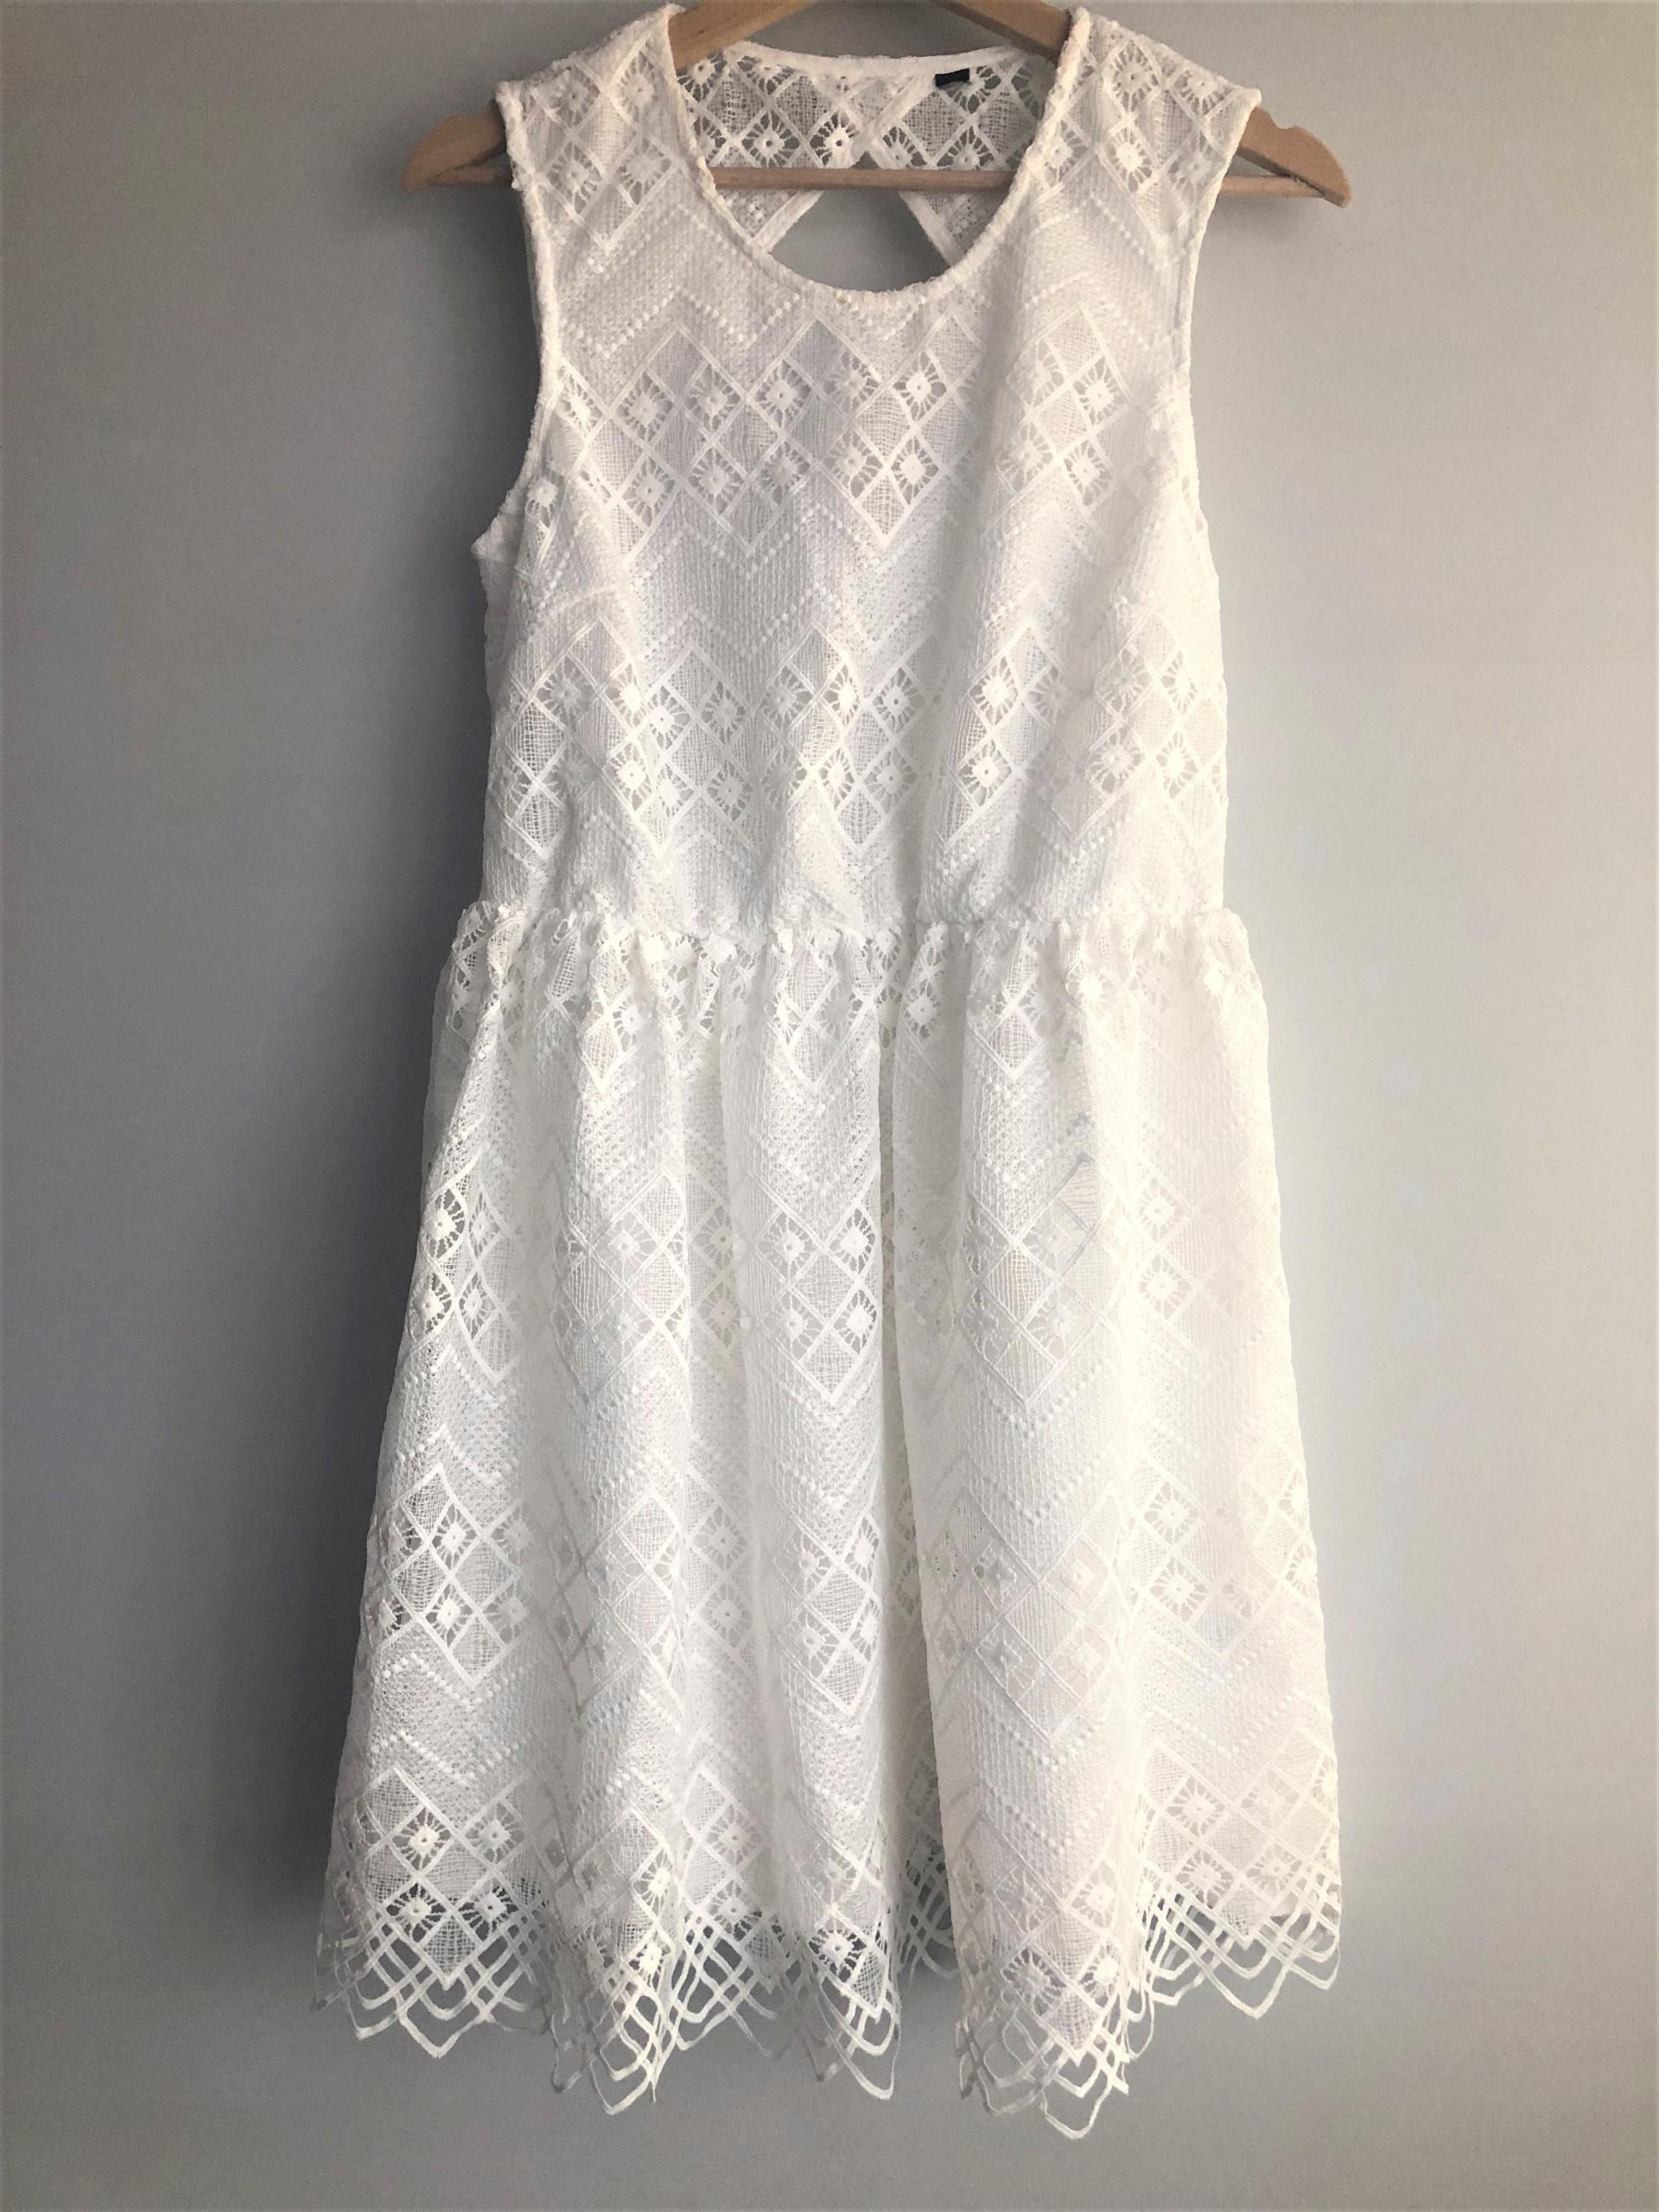 61ed1694da sukienka biała koronkowa nowa M 38 koronka hm - 7584917353 ...